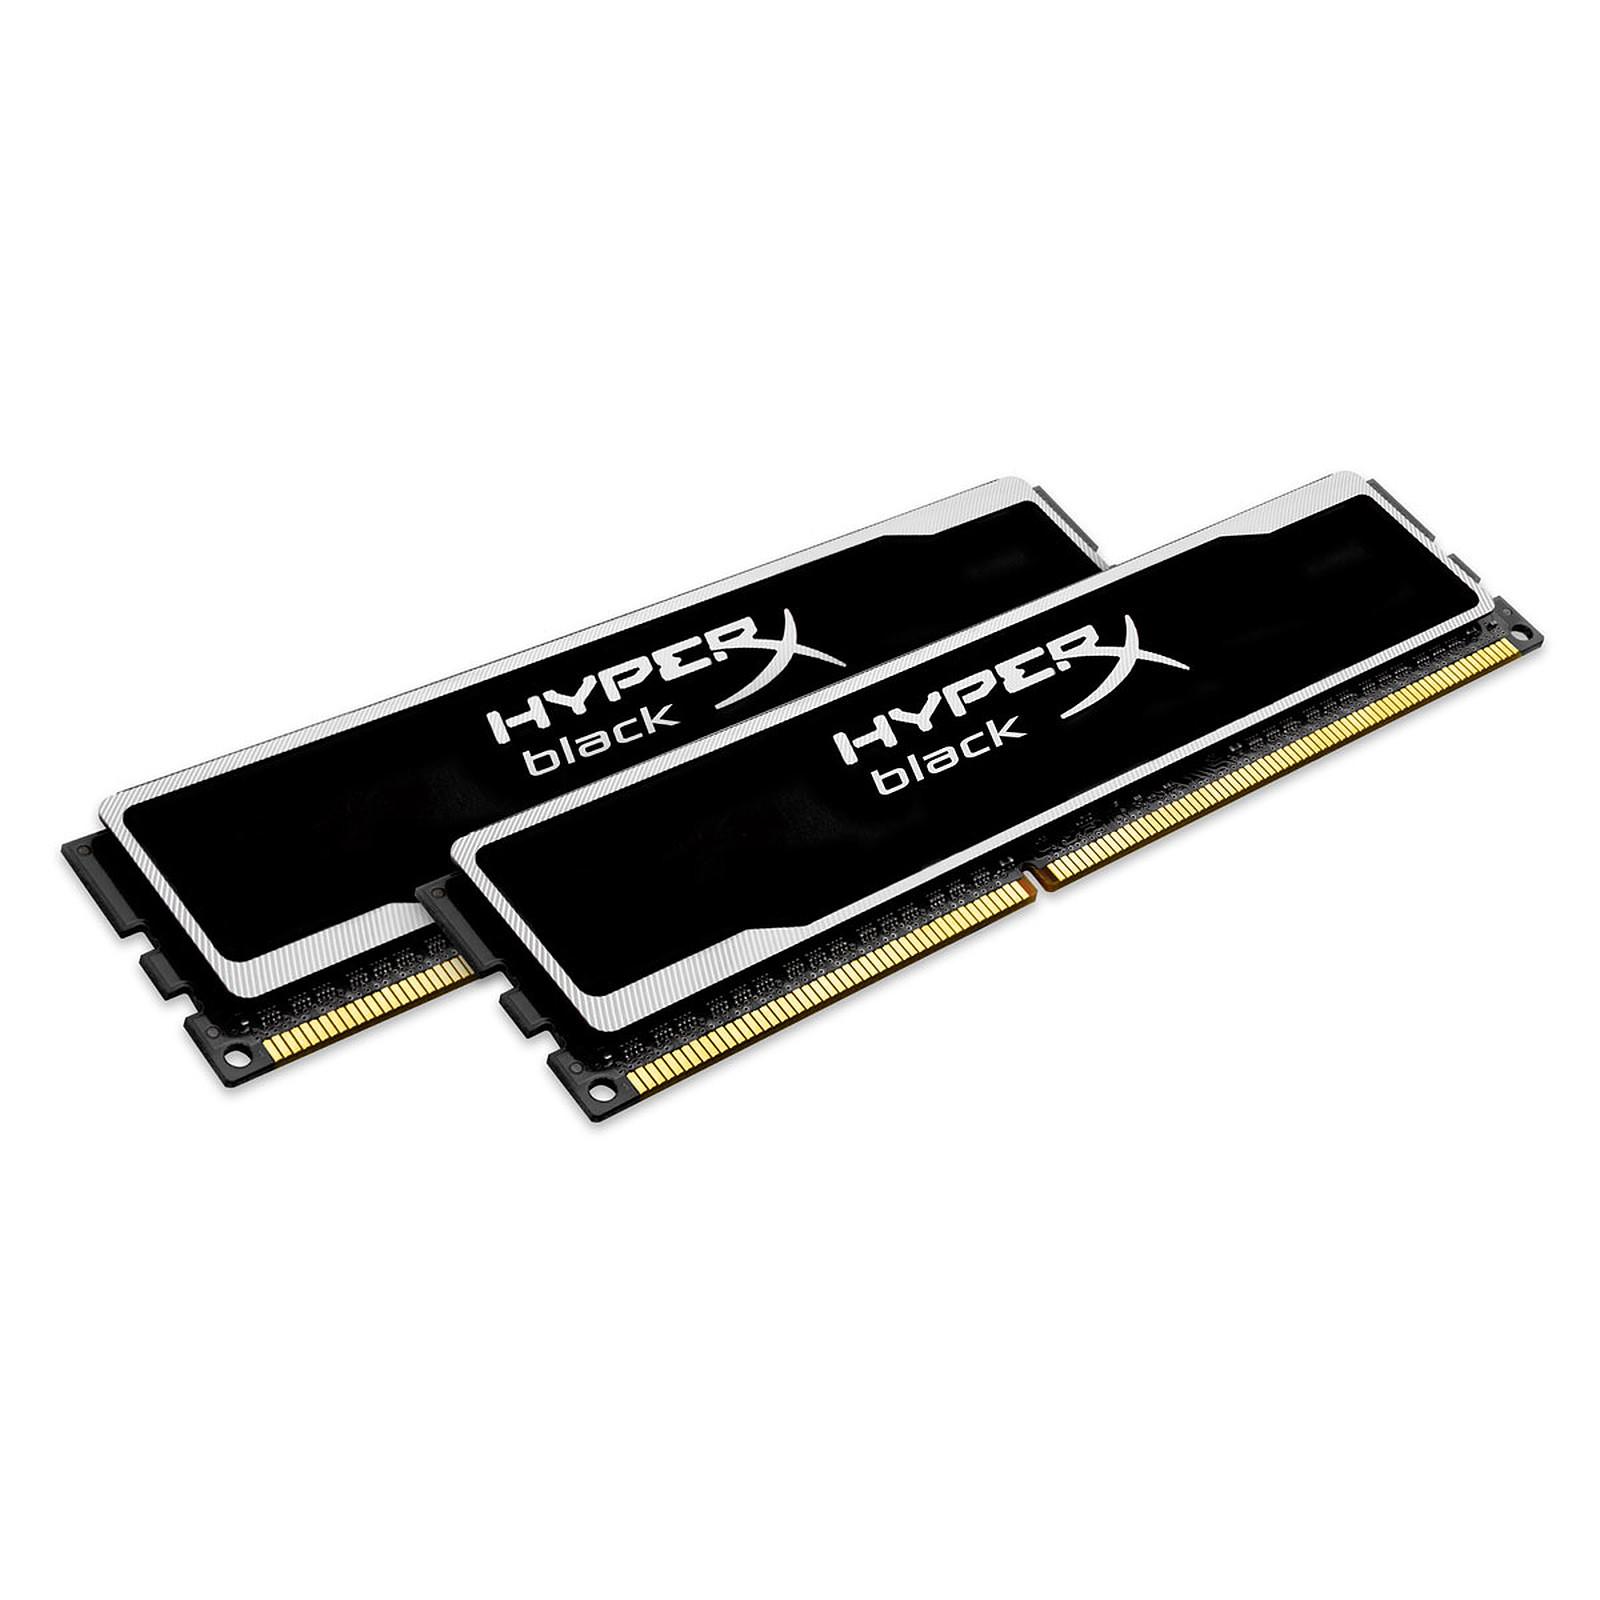 Kingston HyperX black 8 Go (2x 4Go) DDR3 1600 MHz CL9